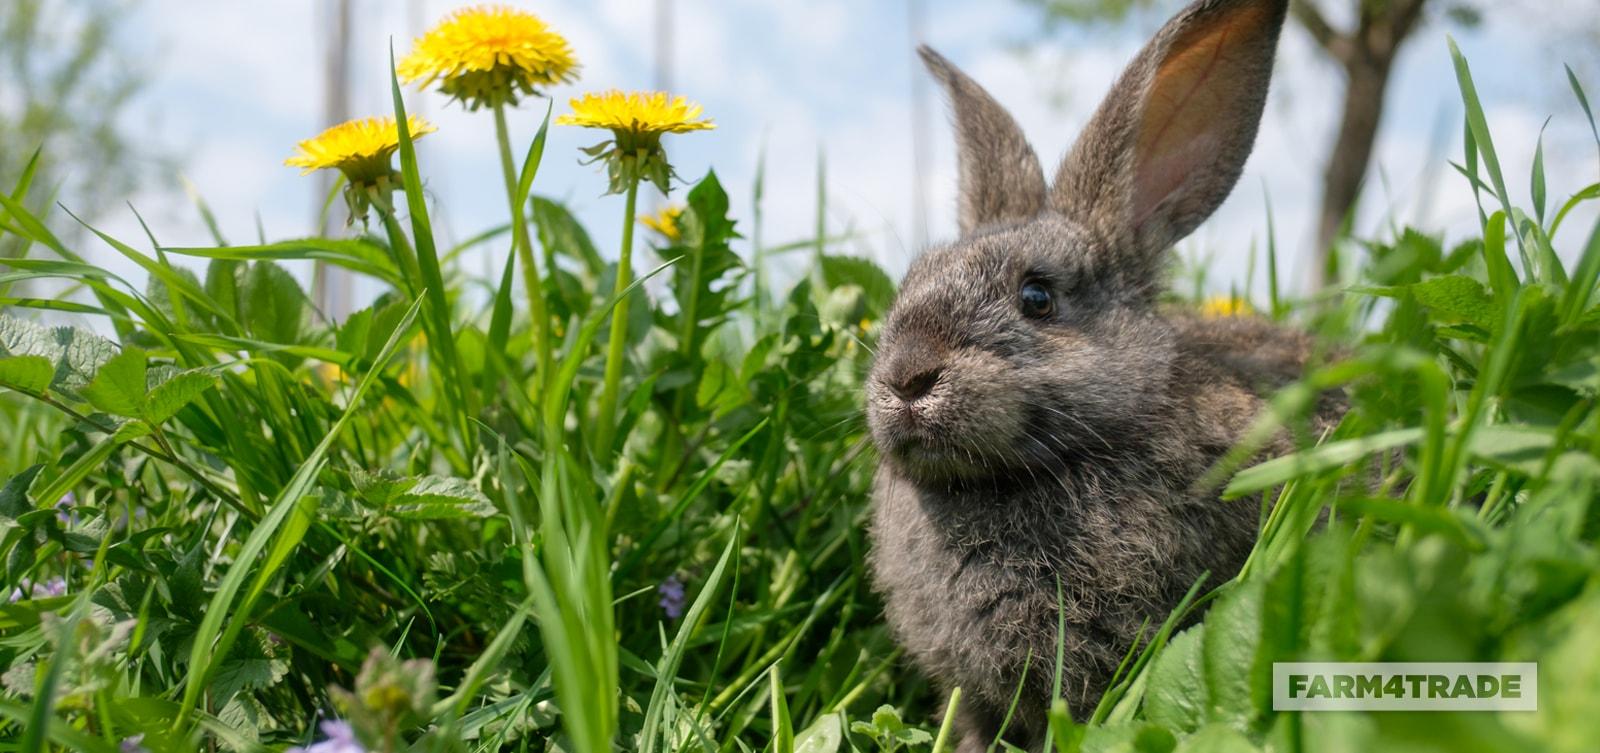 10 reasons to start raising rabbits-Farm4Trade